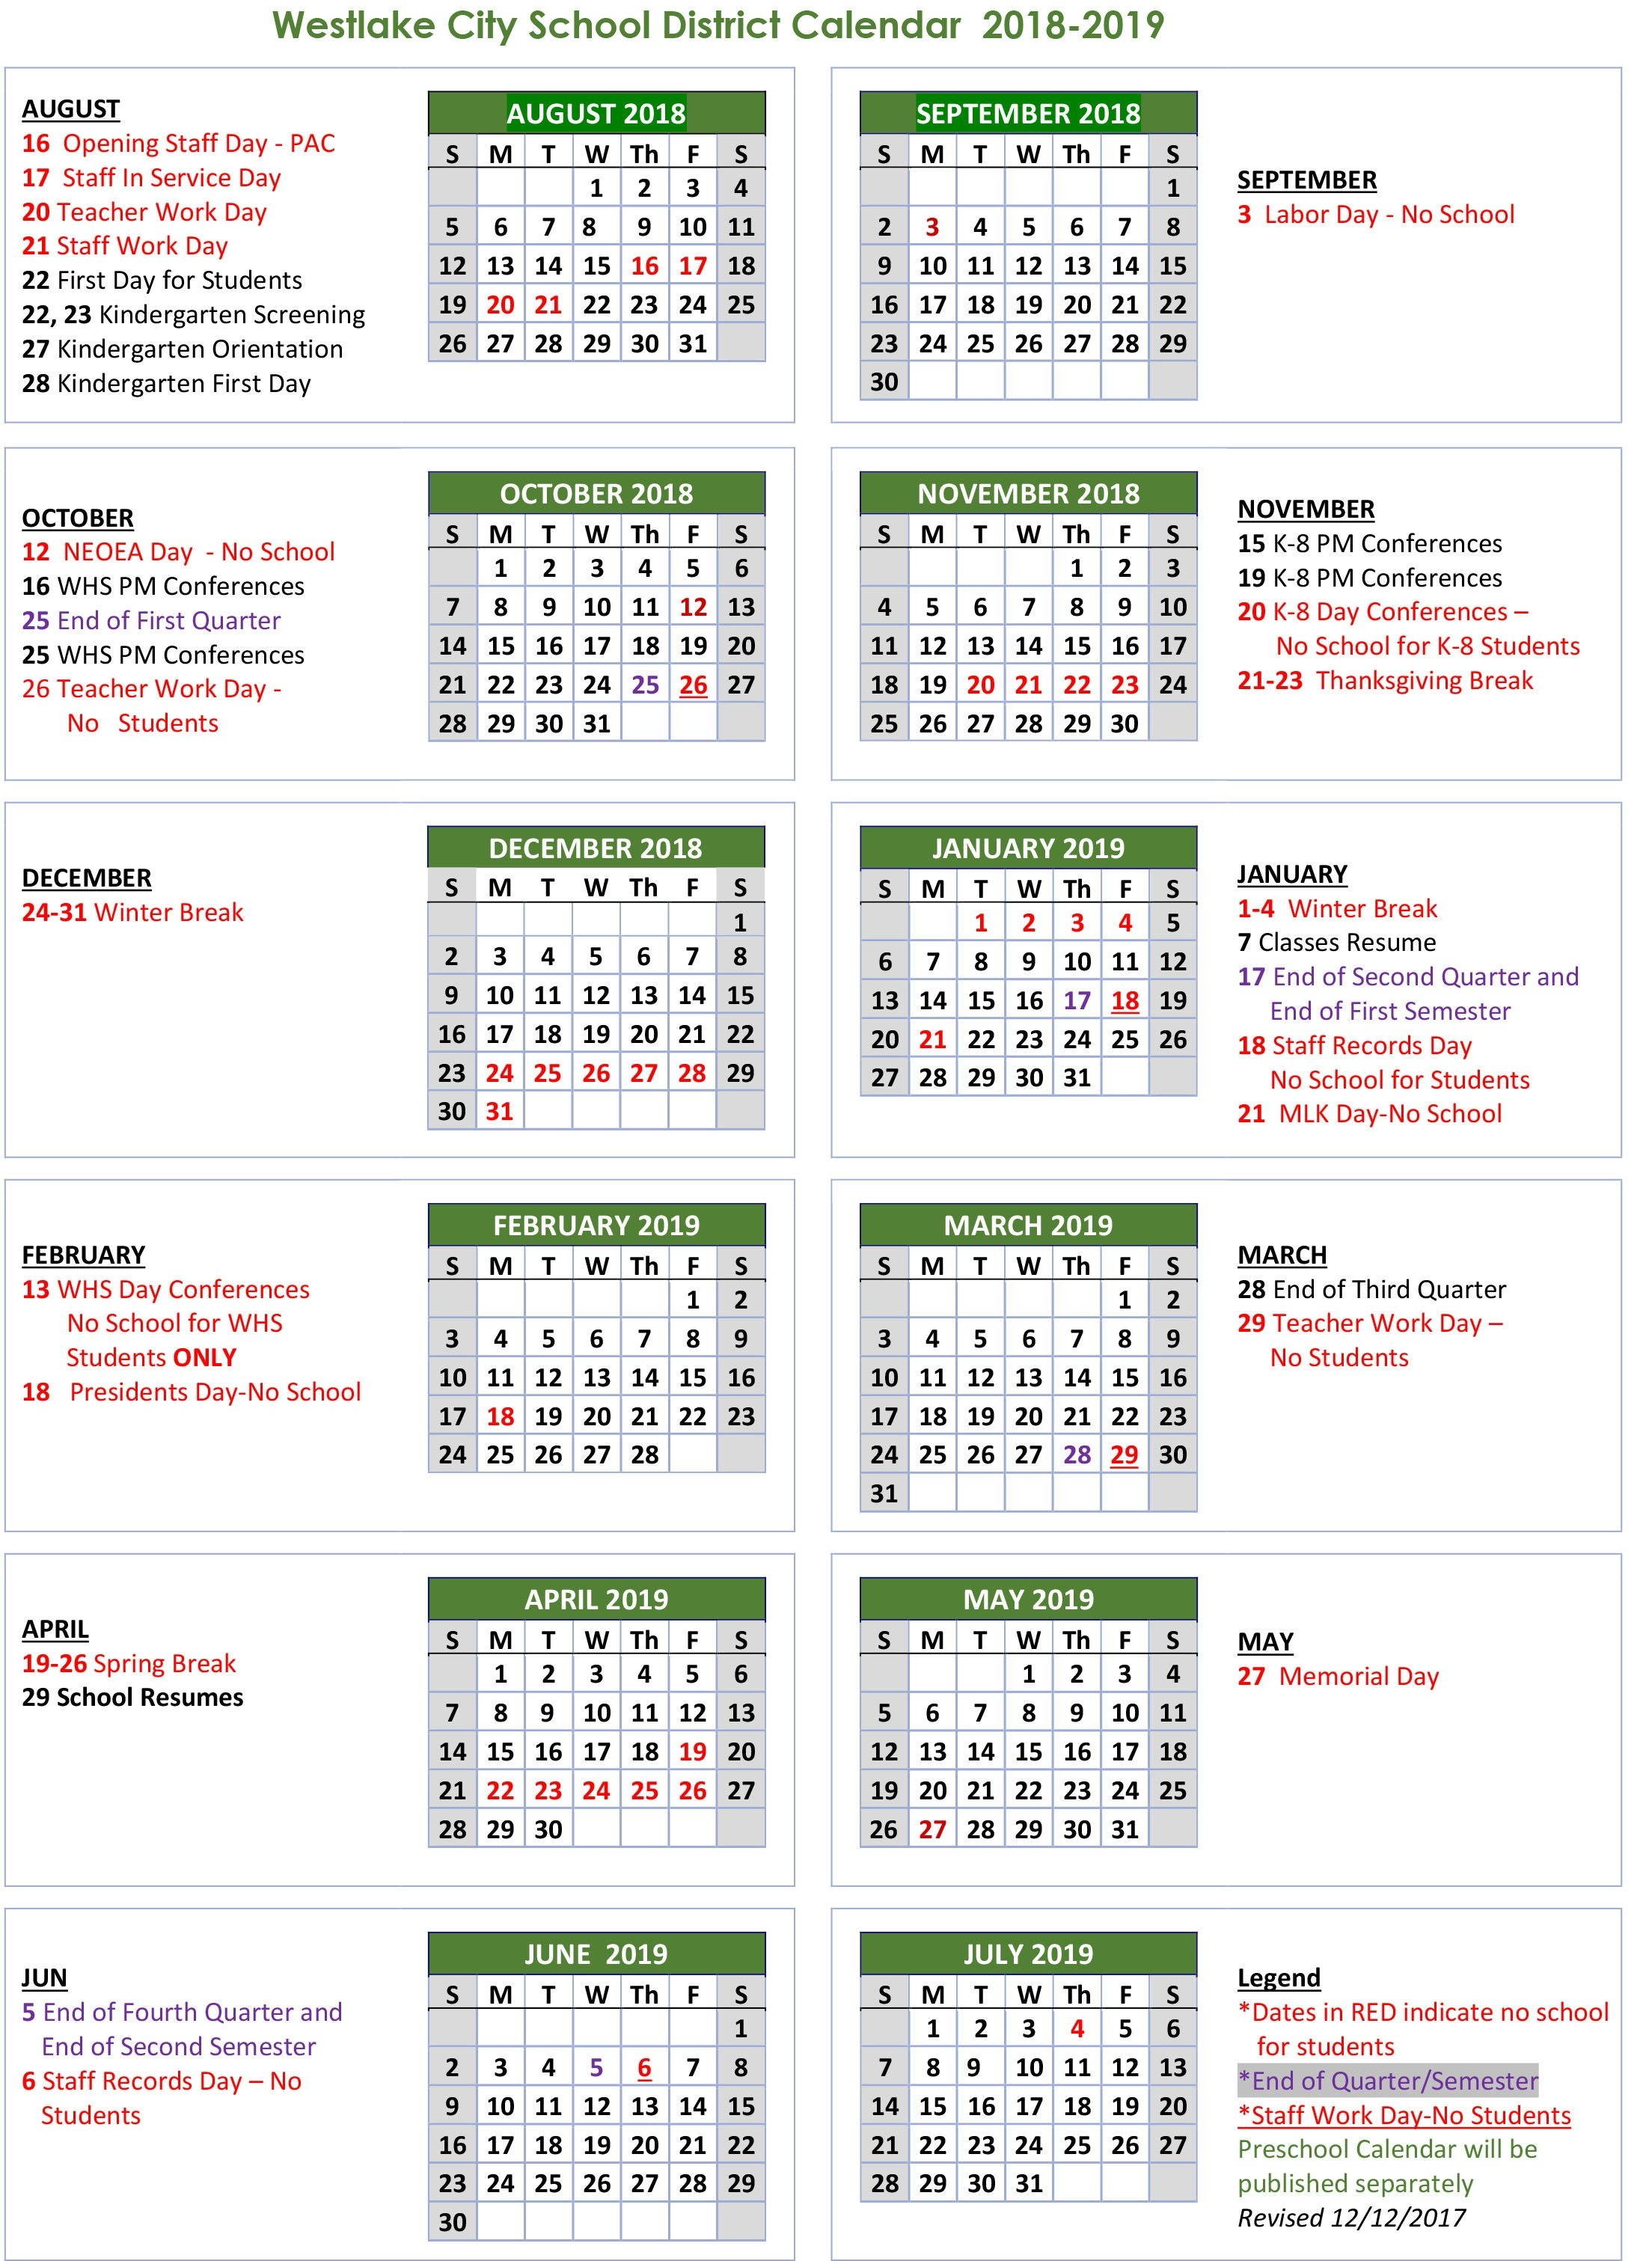 School Calendar – Westlake City School District Unit 5 Calendar 2019